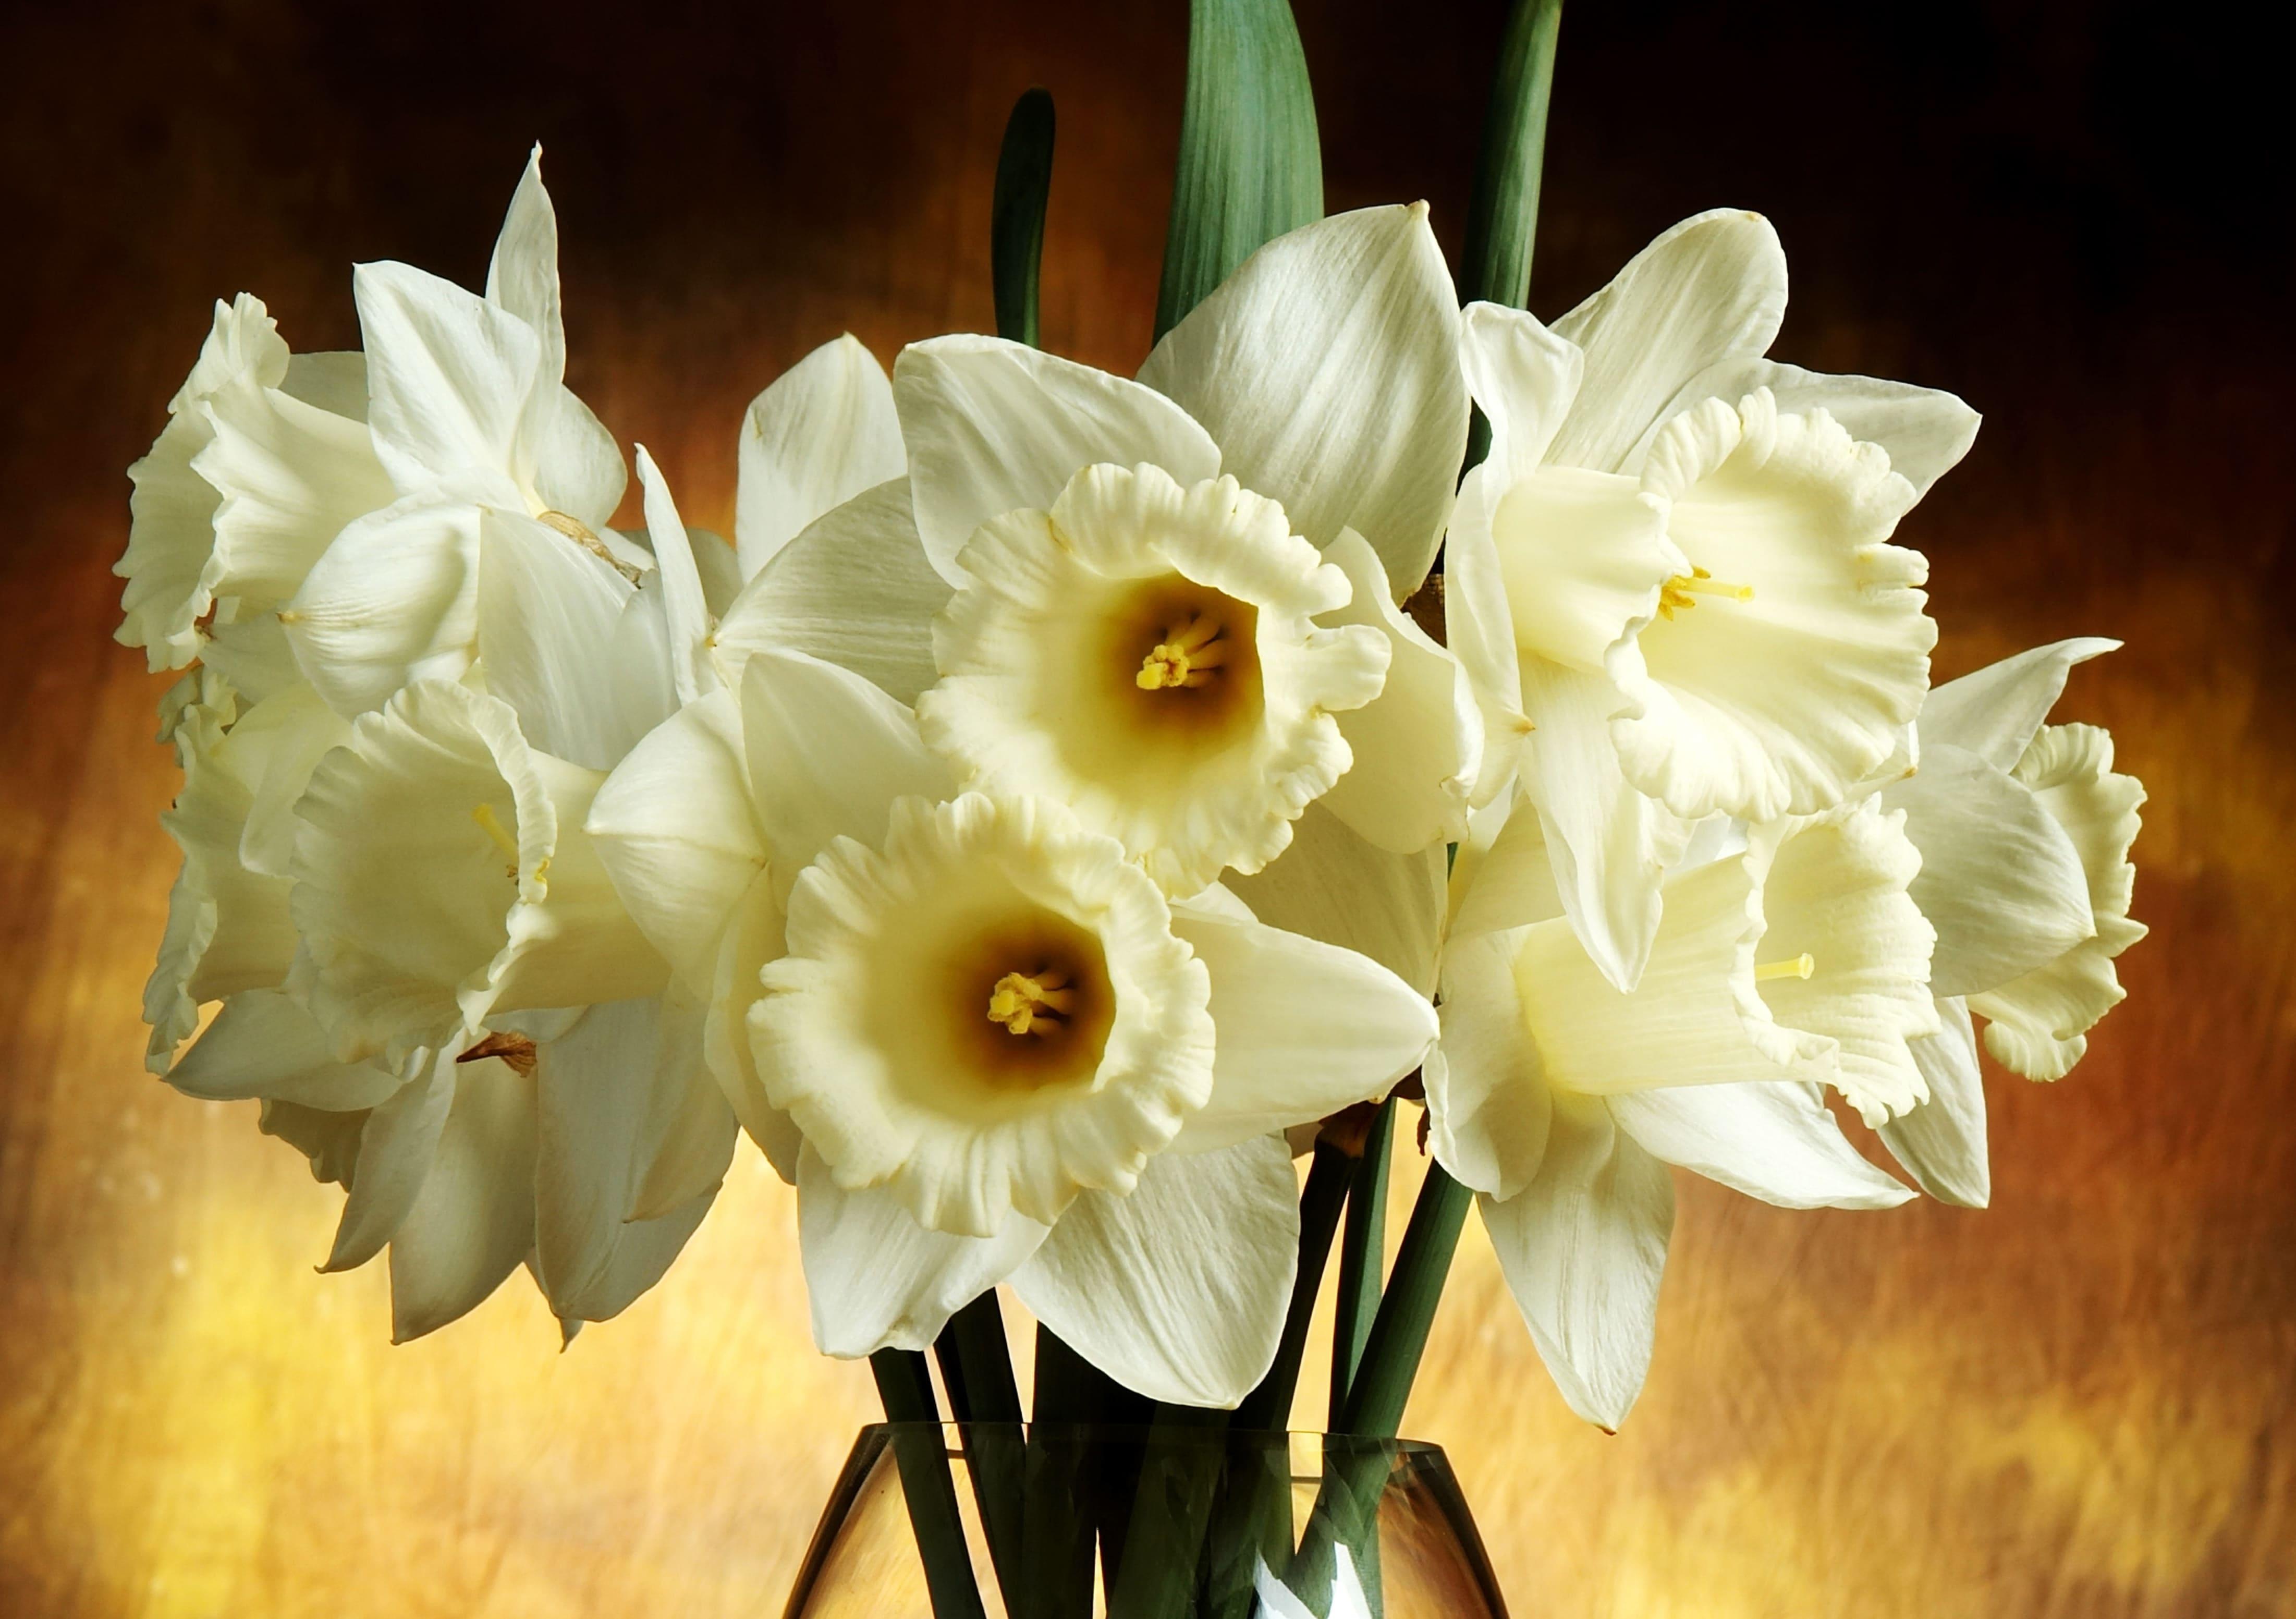 daffodils-photo-29